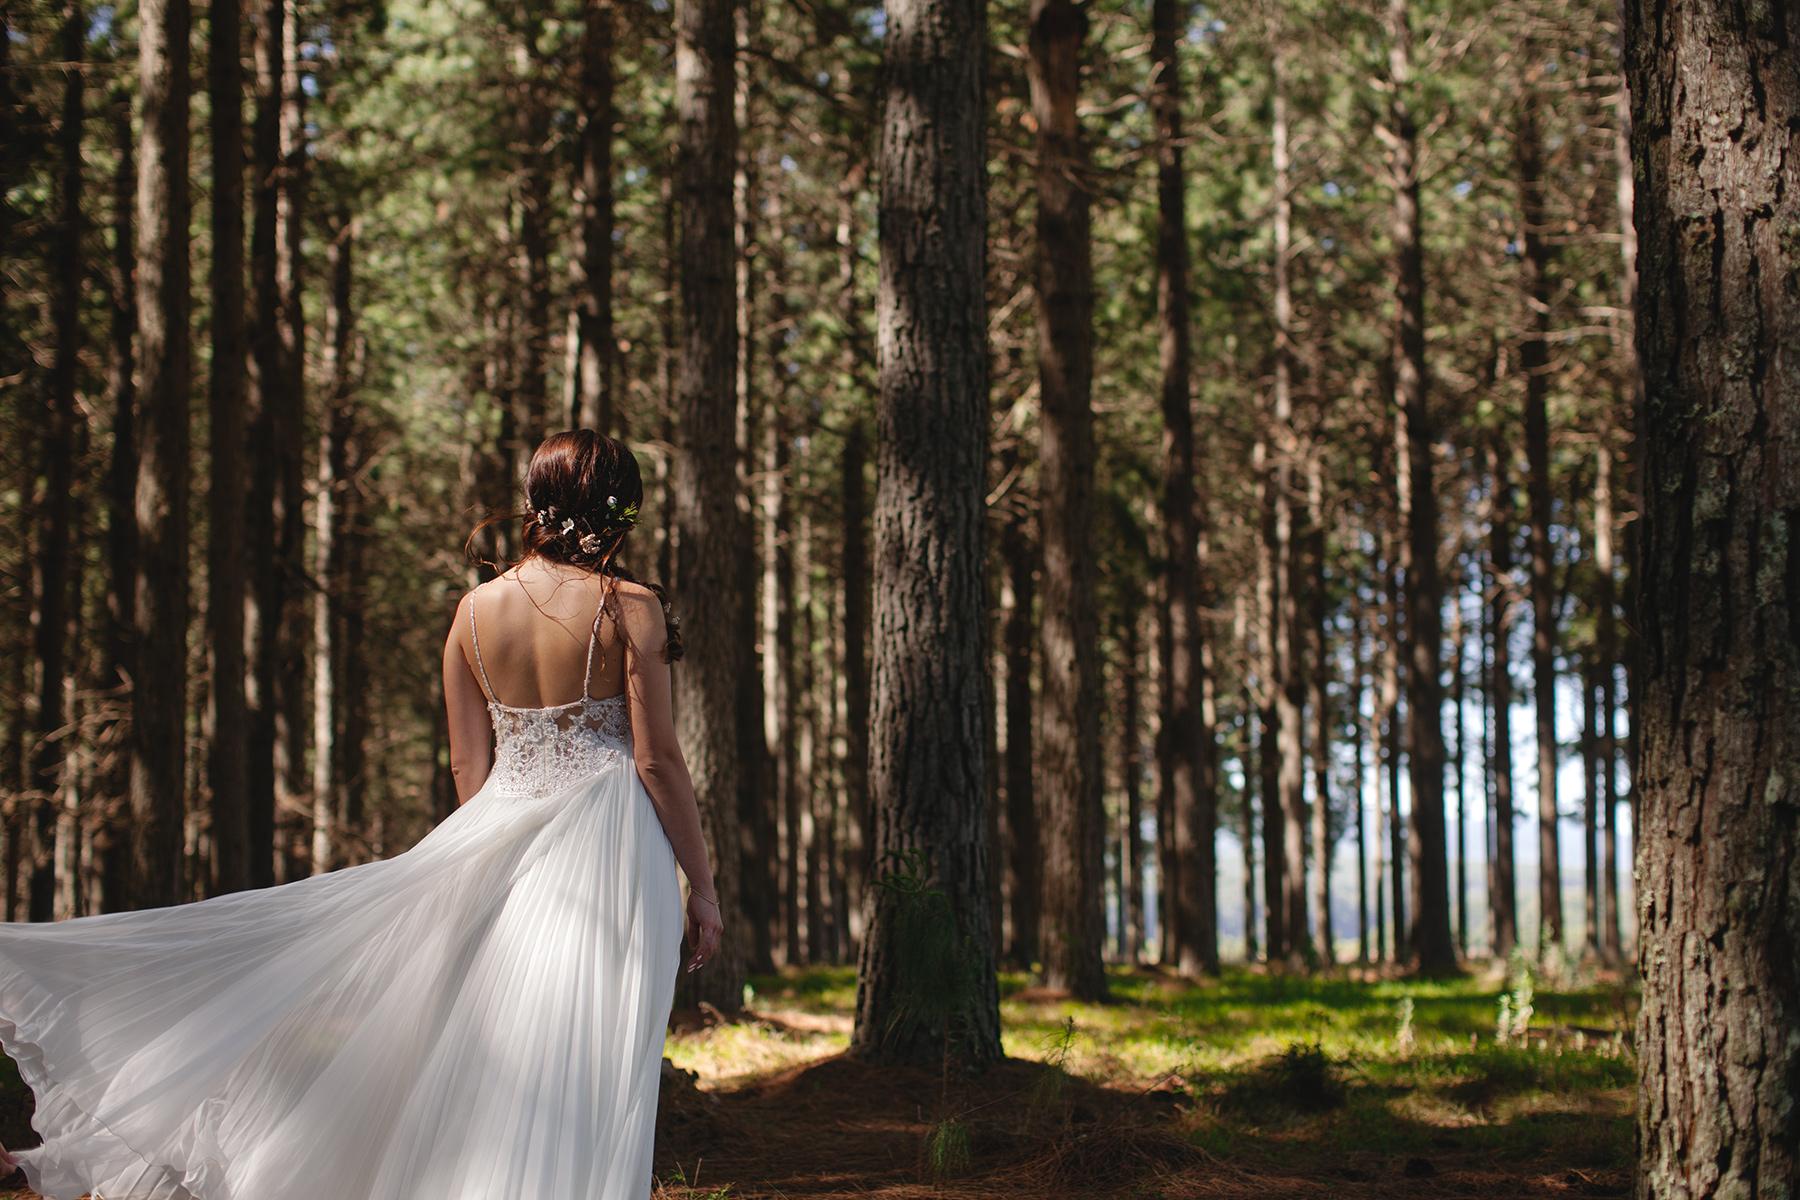 Bridal11Nov2018_HMP_55_Web.jpg